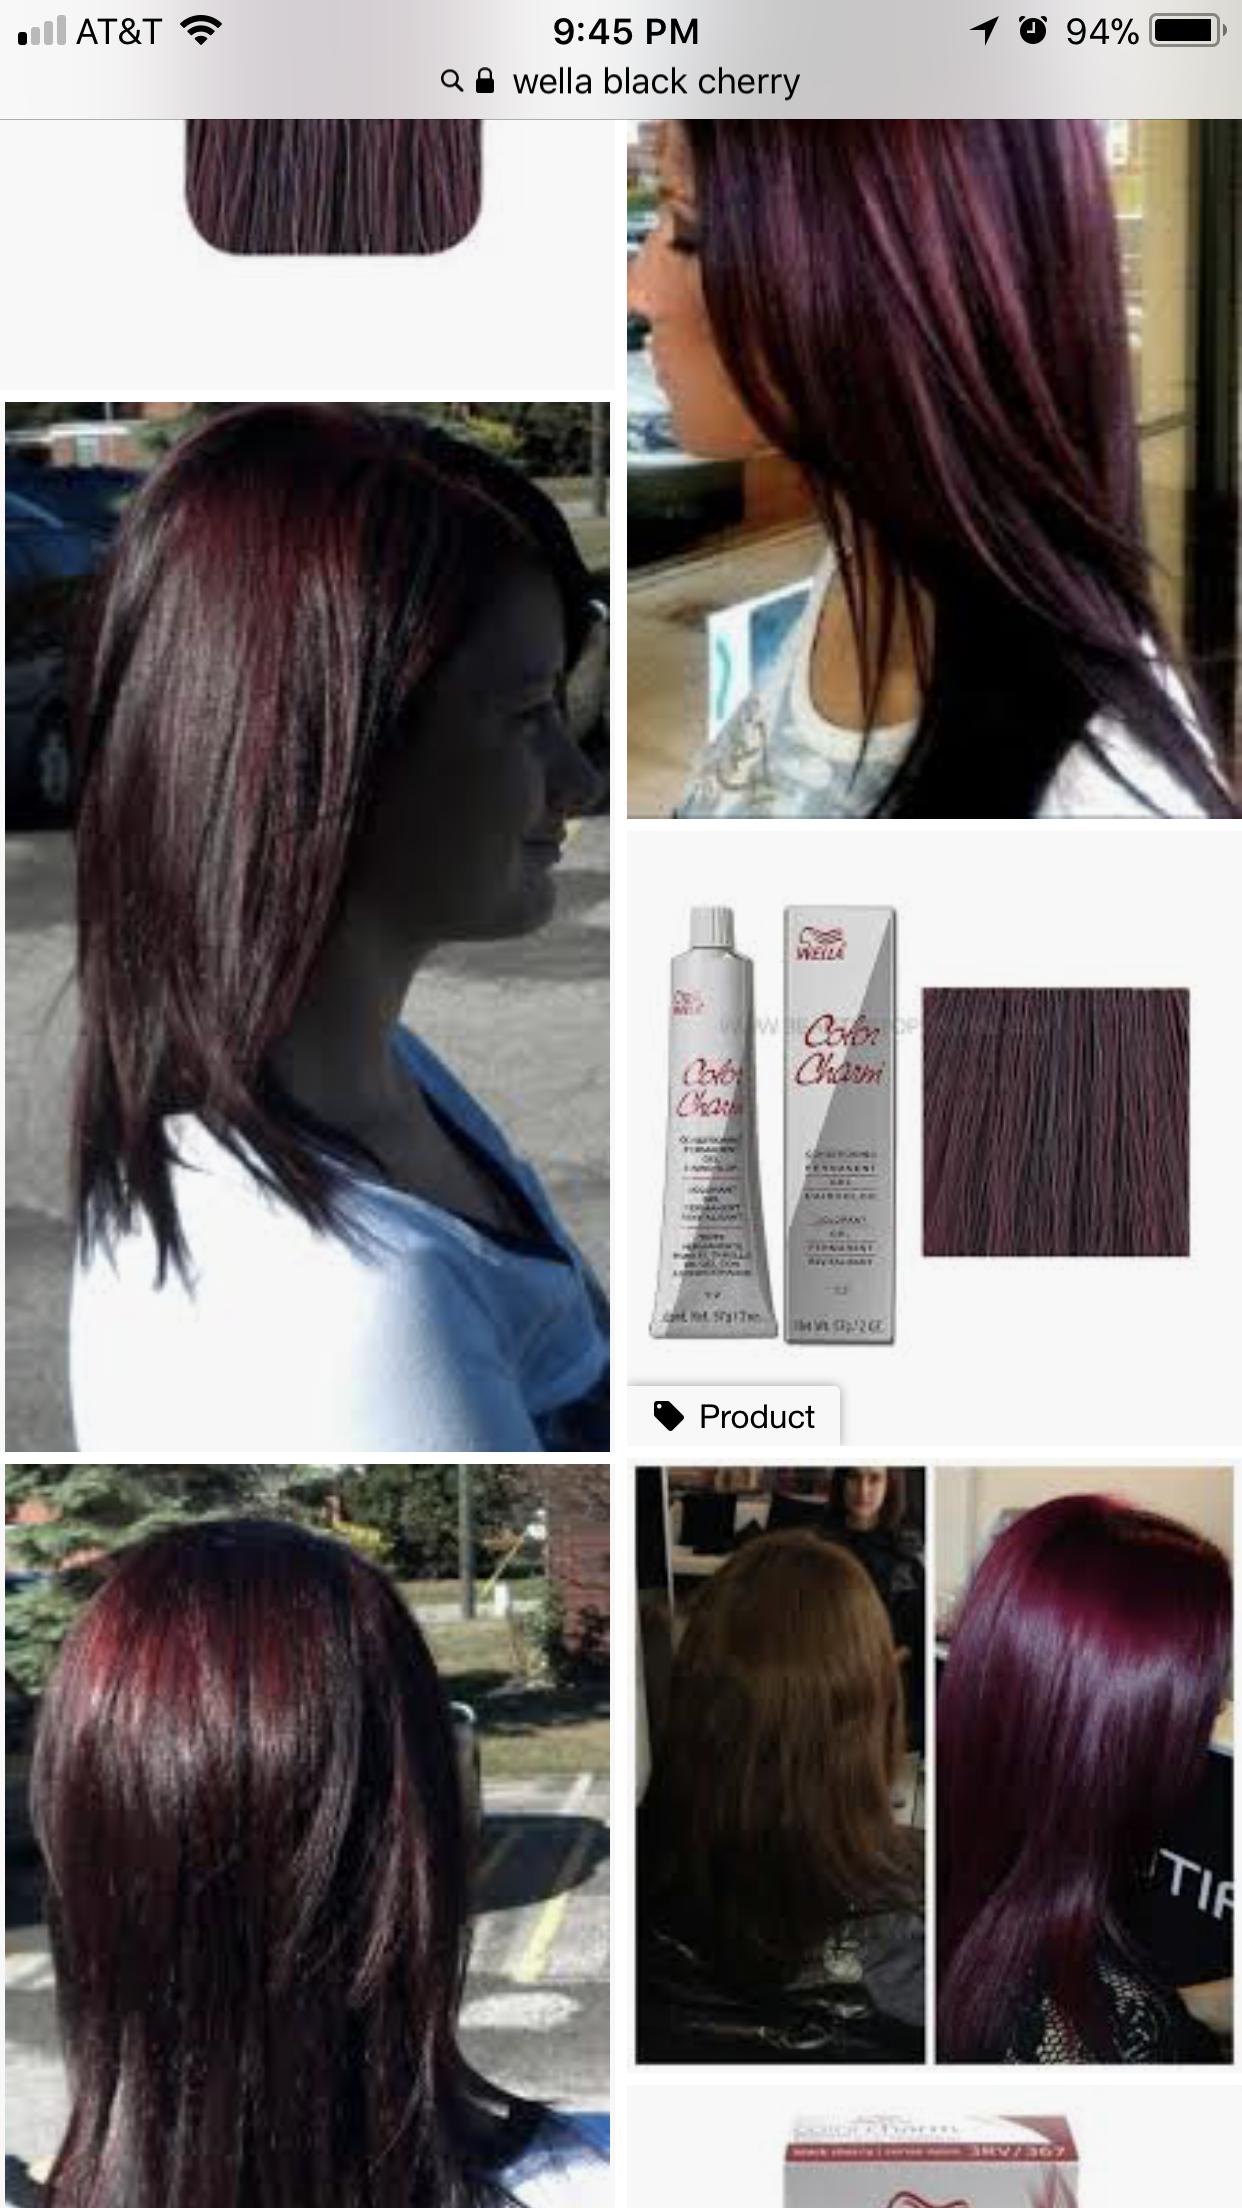 Wella Black Cherry In 2019 Black Cherry Hair Color